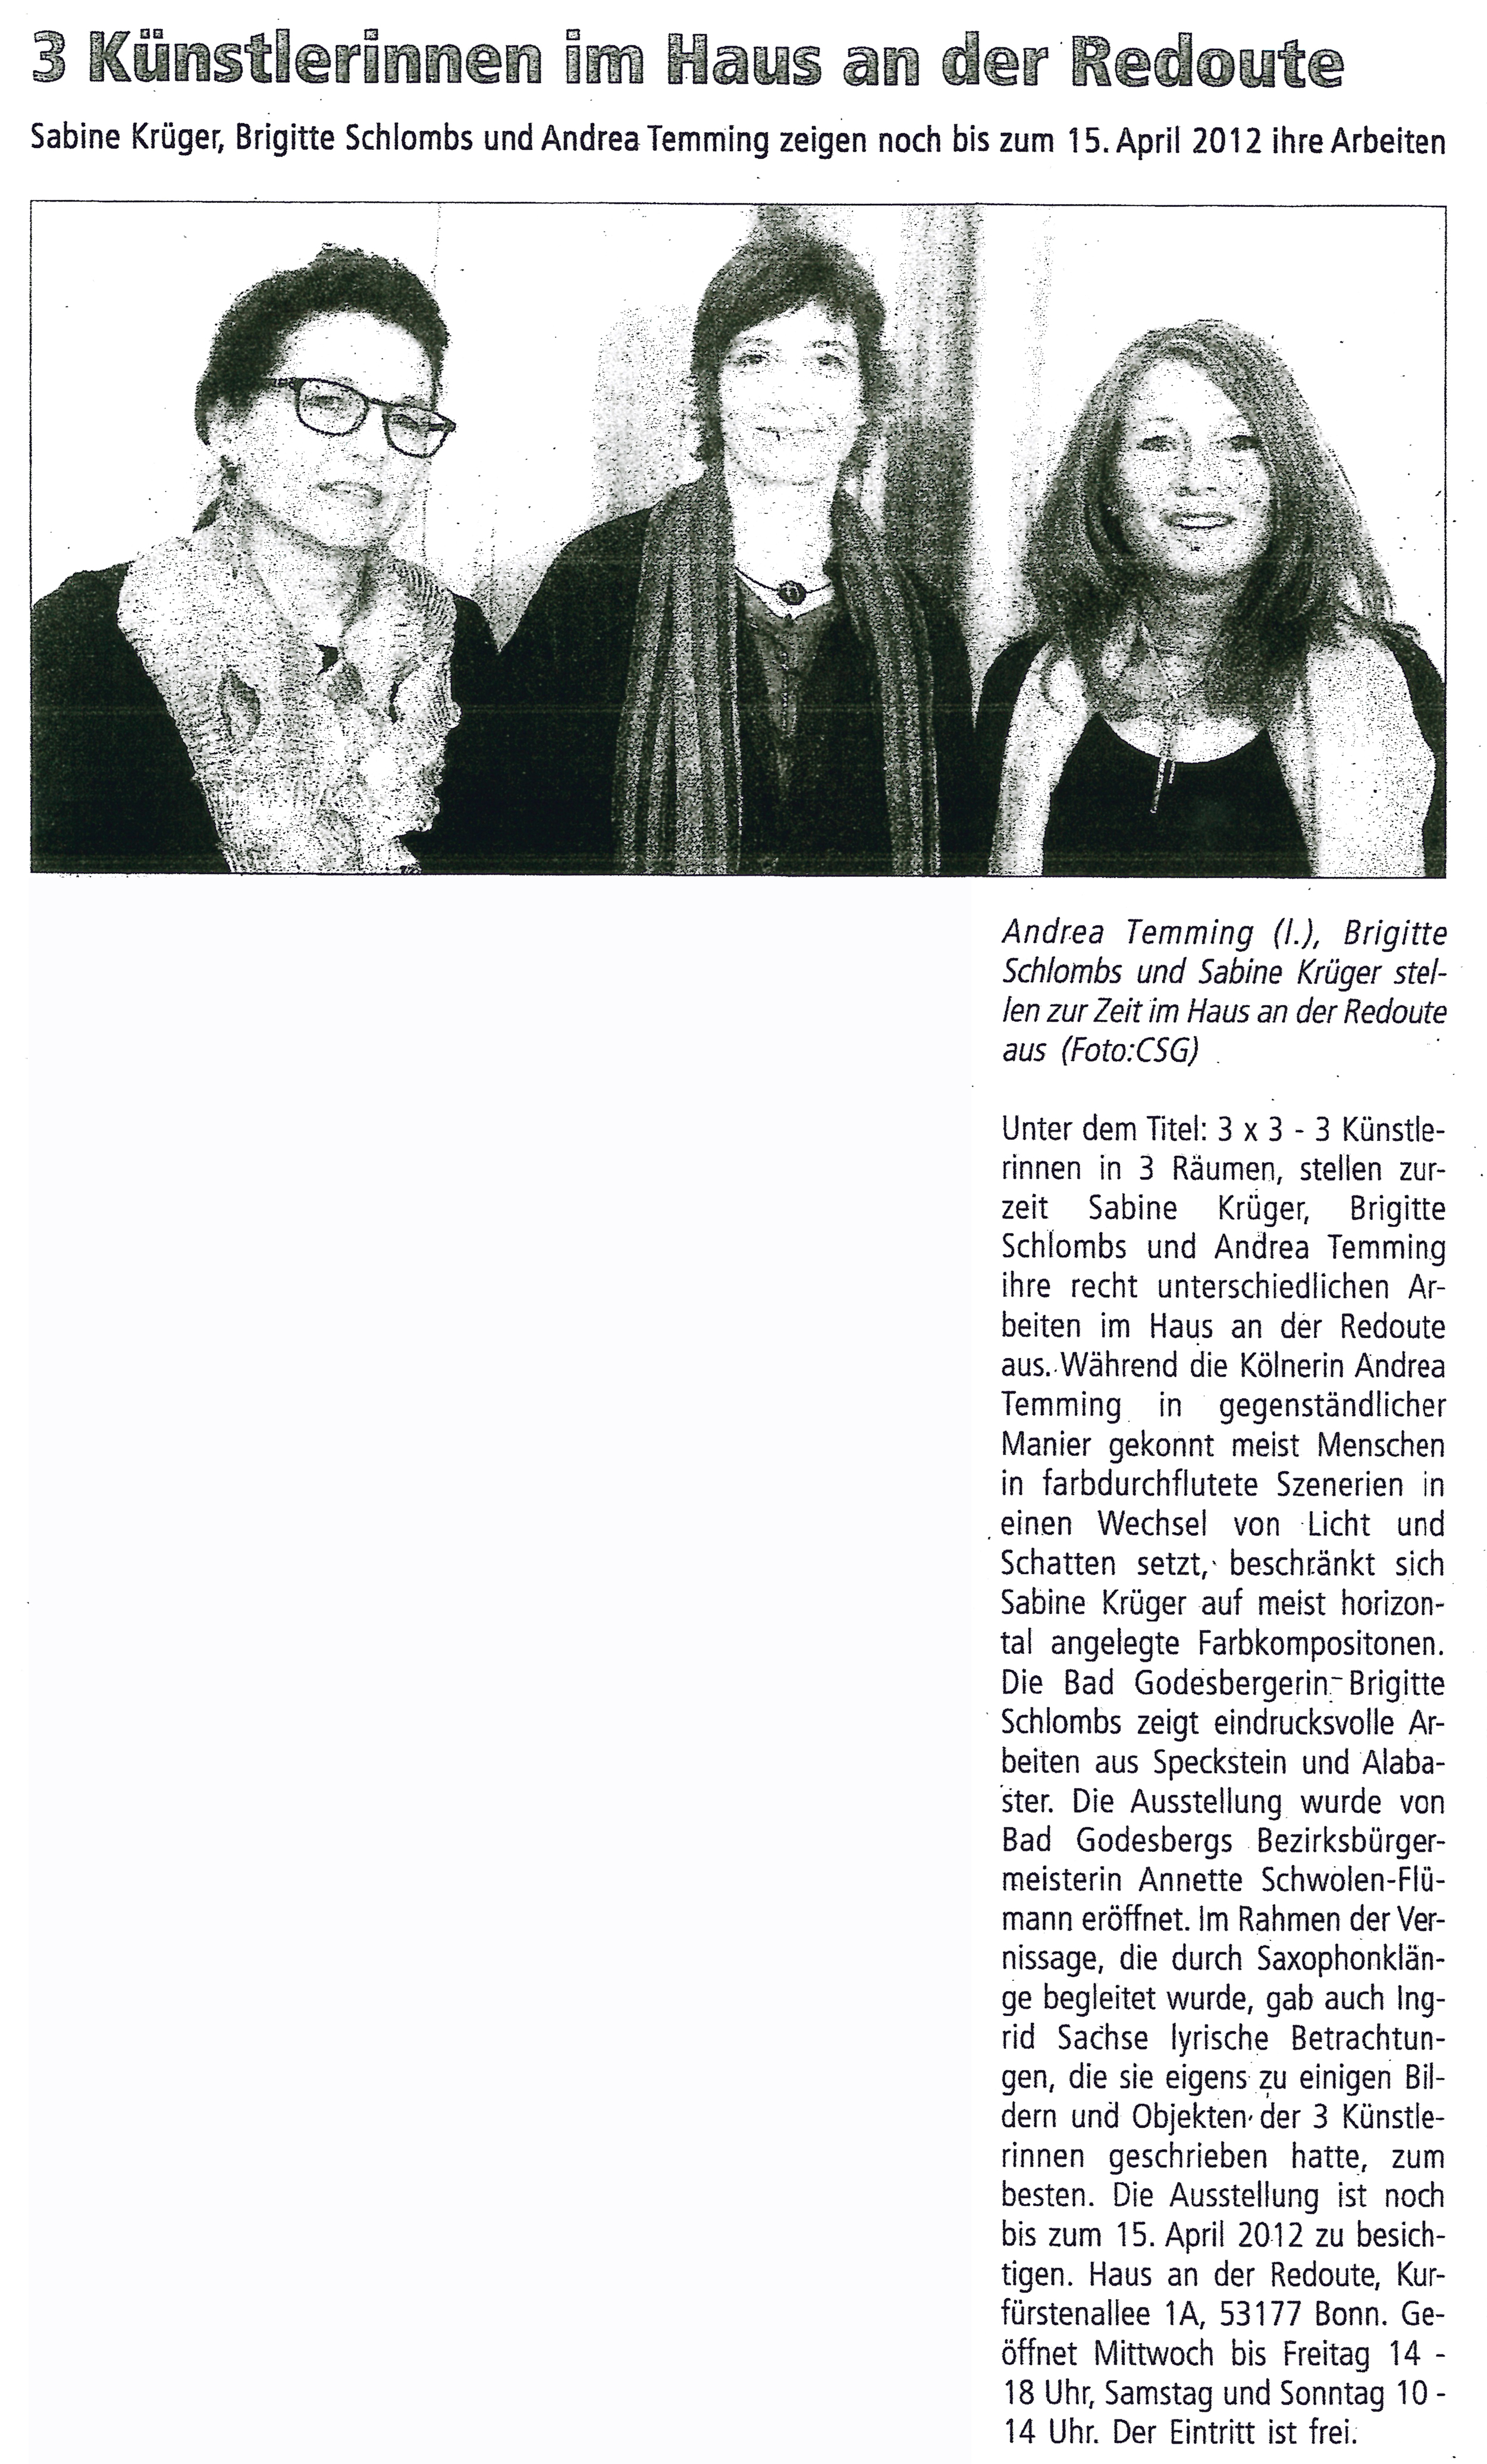 Mitteilungsblatt Bad Godelsberg, 31. März 2012